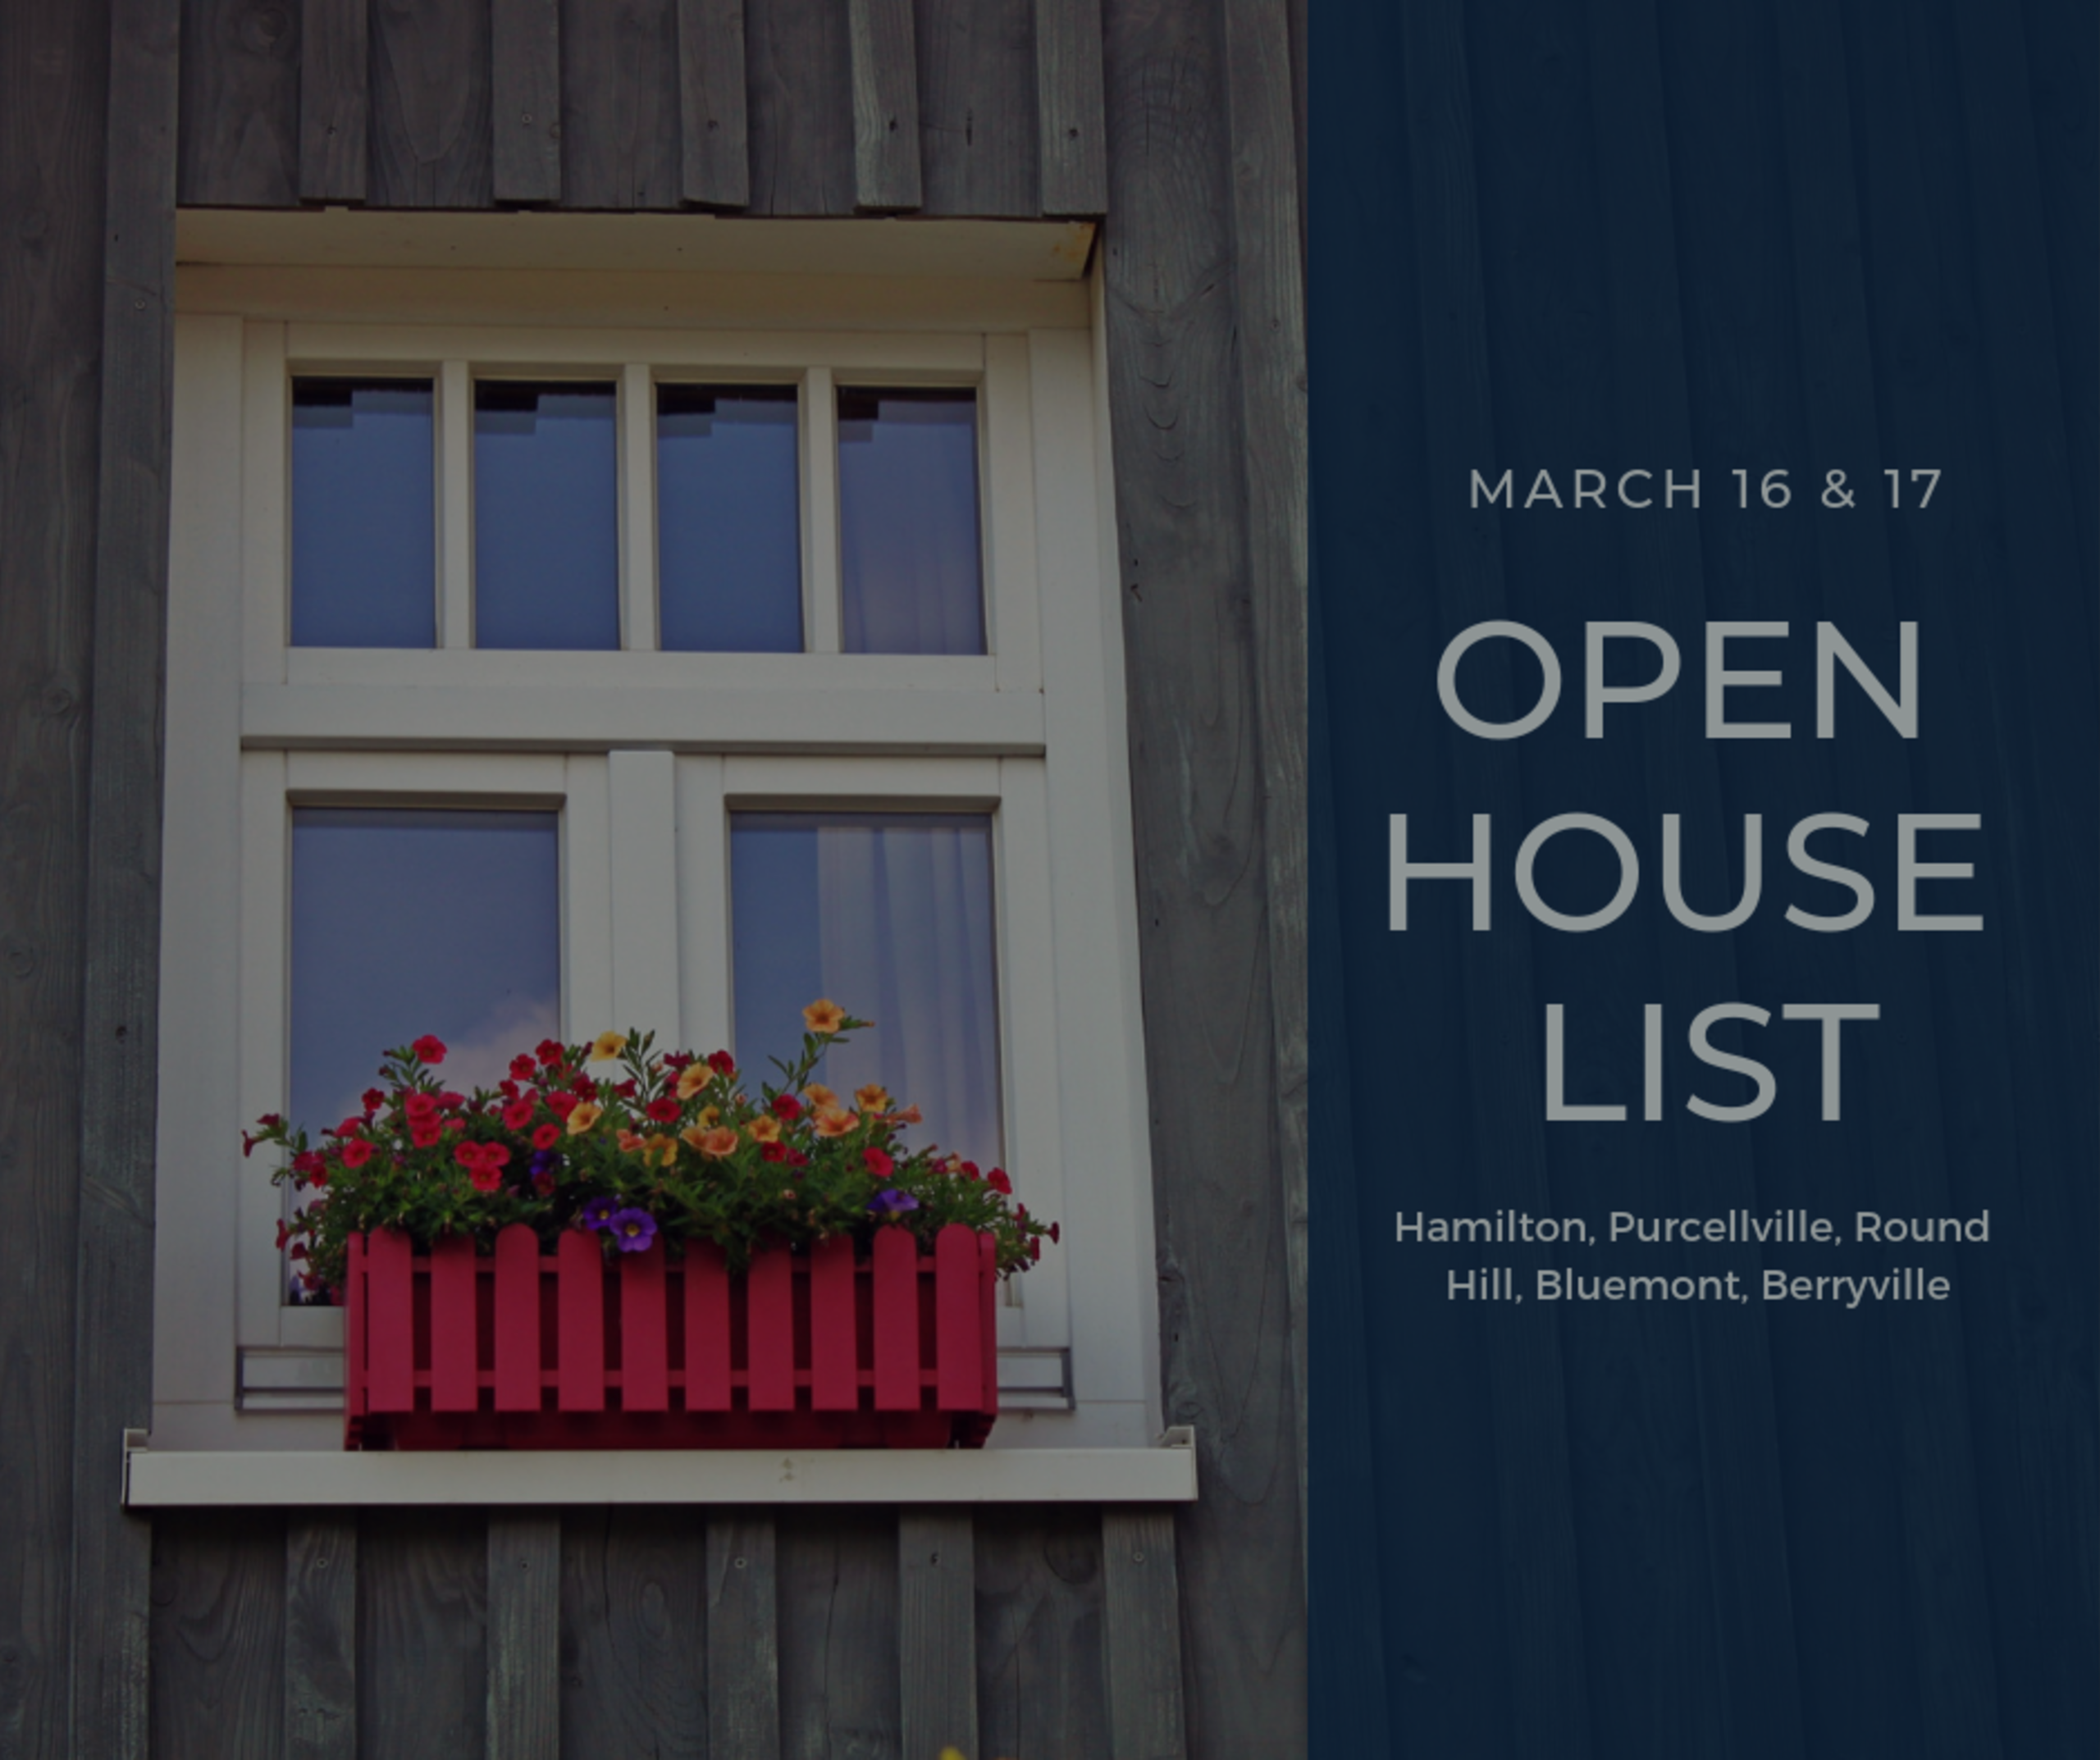 Open House List 3/16/19 – 3/17/19